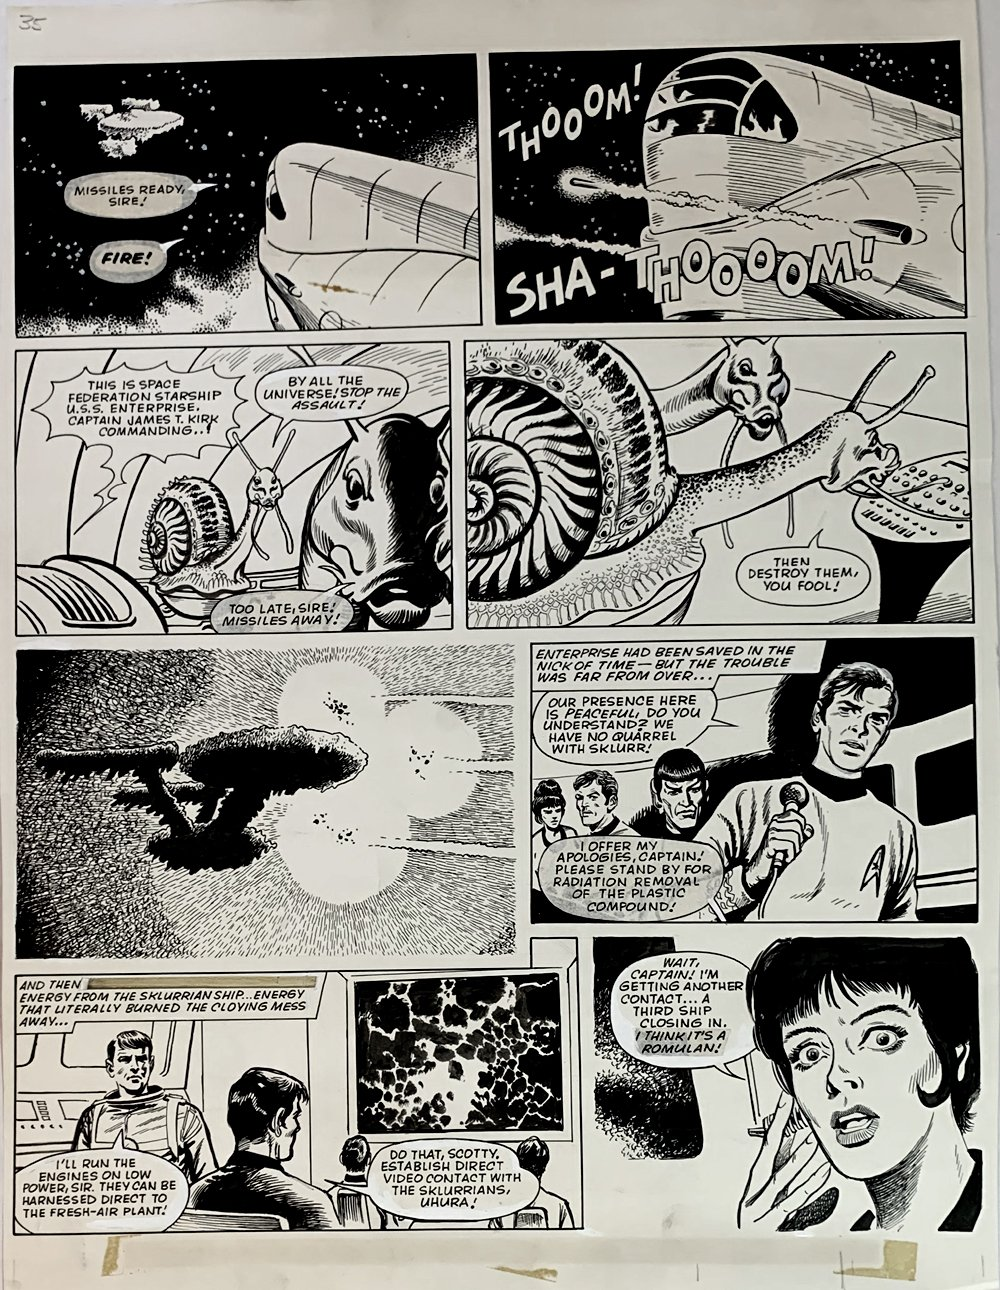 Star Trek Newspaper Strip 7-21-1973 (VERY LARGE)